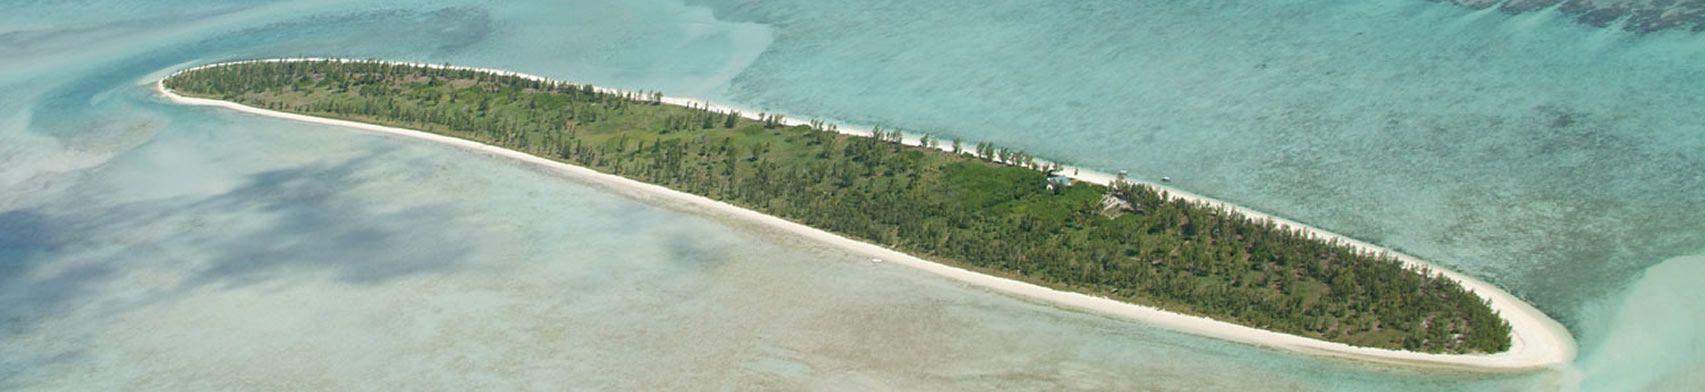 rodrigues_aerial_view_islet